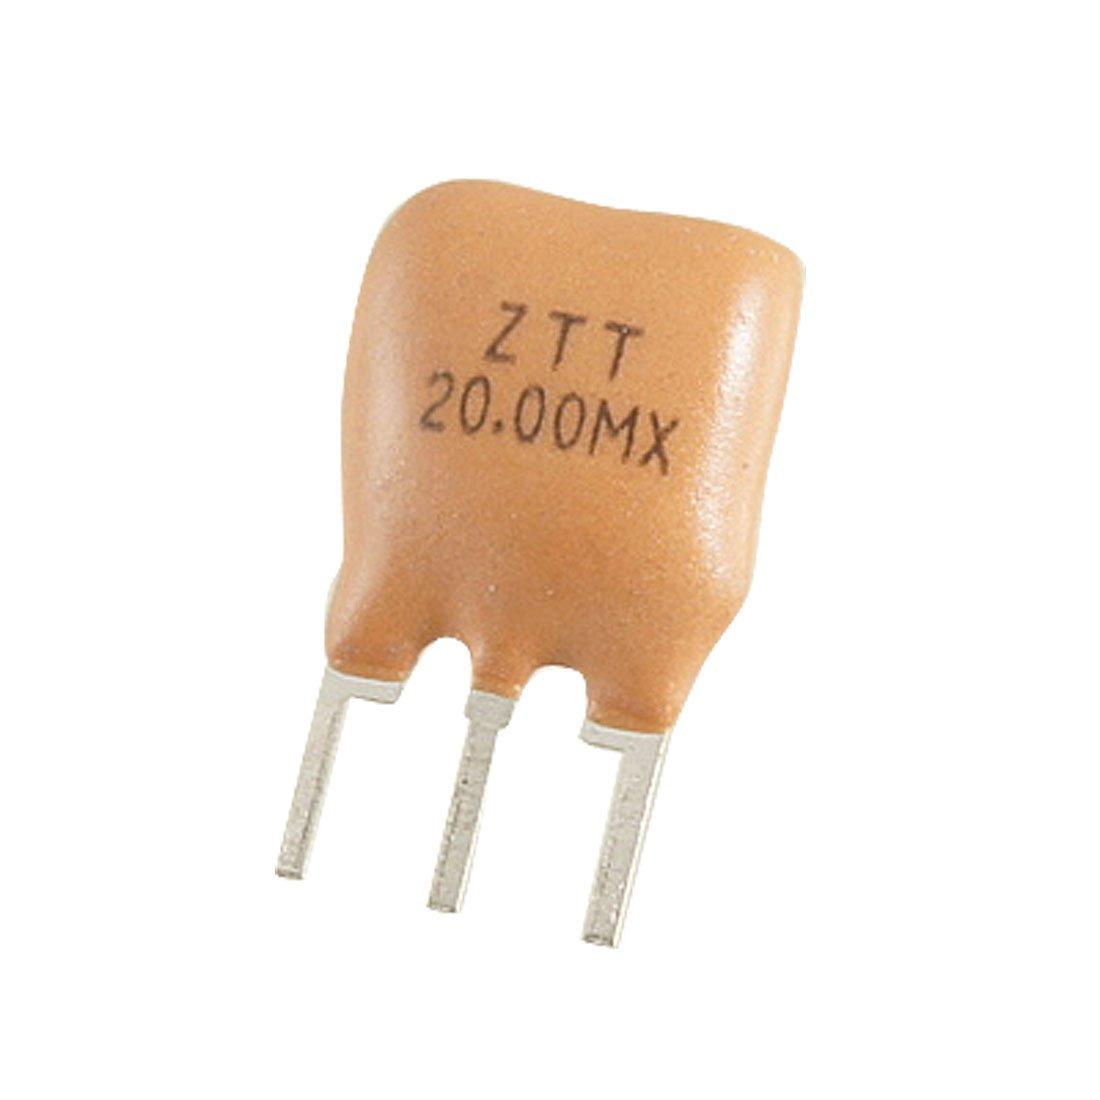 Uxcell a11101800ux0100 ZTT Series Through Hole Ceramic Resonators 3 Pins, 20 MHz